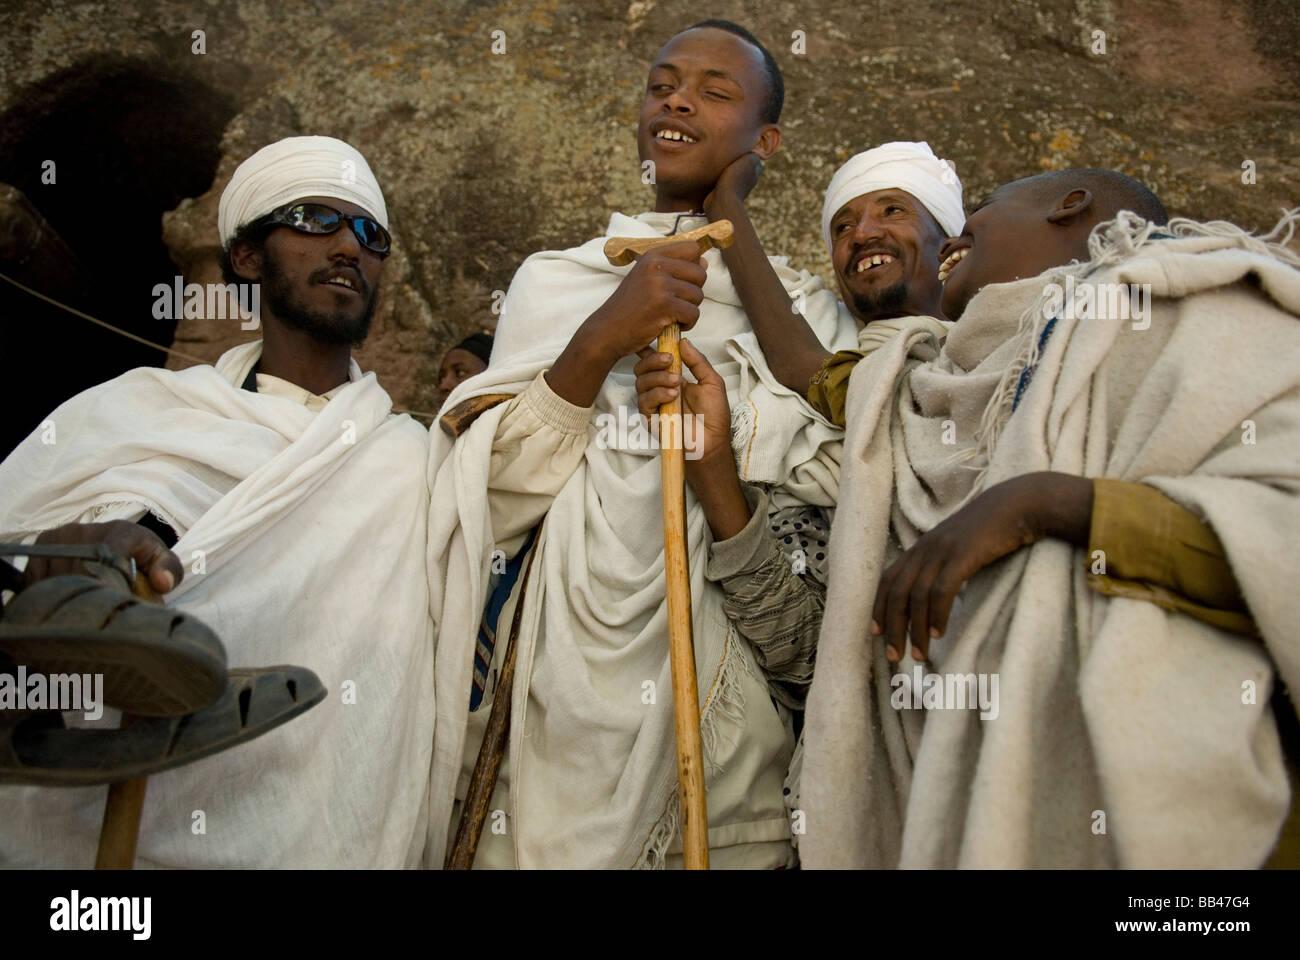 Group of blind pilgrims during Timkat festival in Lalibela, Ethiopia. - Stock Image